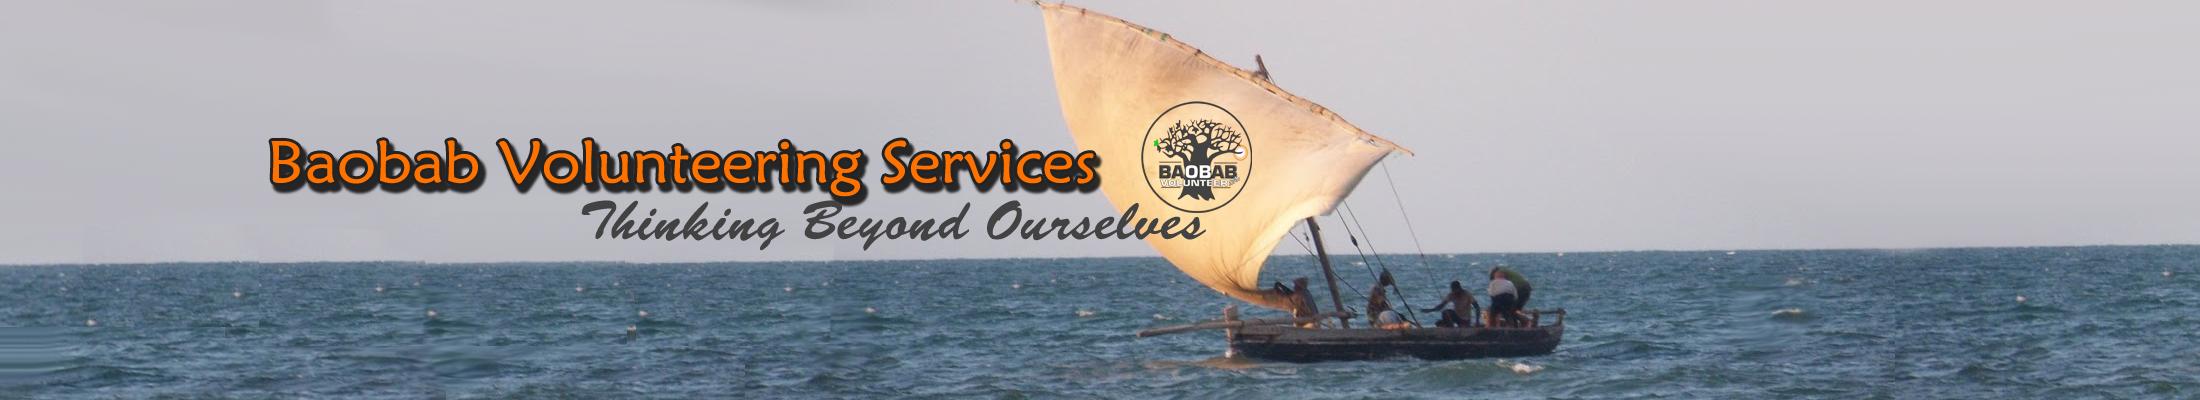 Baobab Volunteering Services